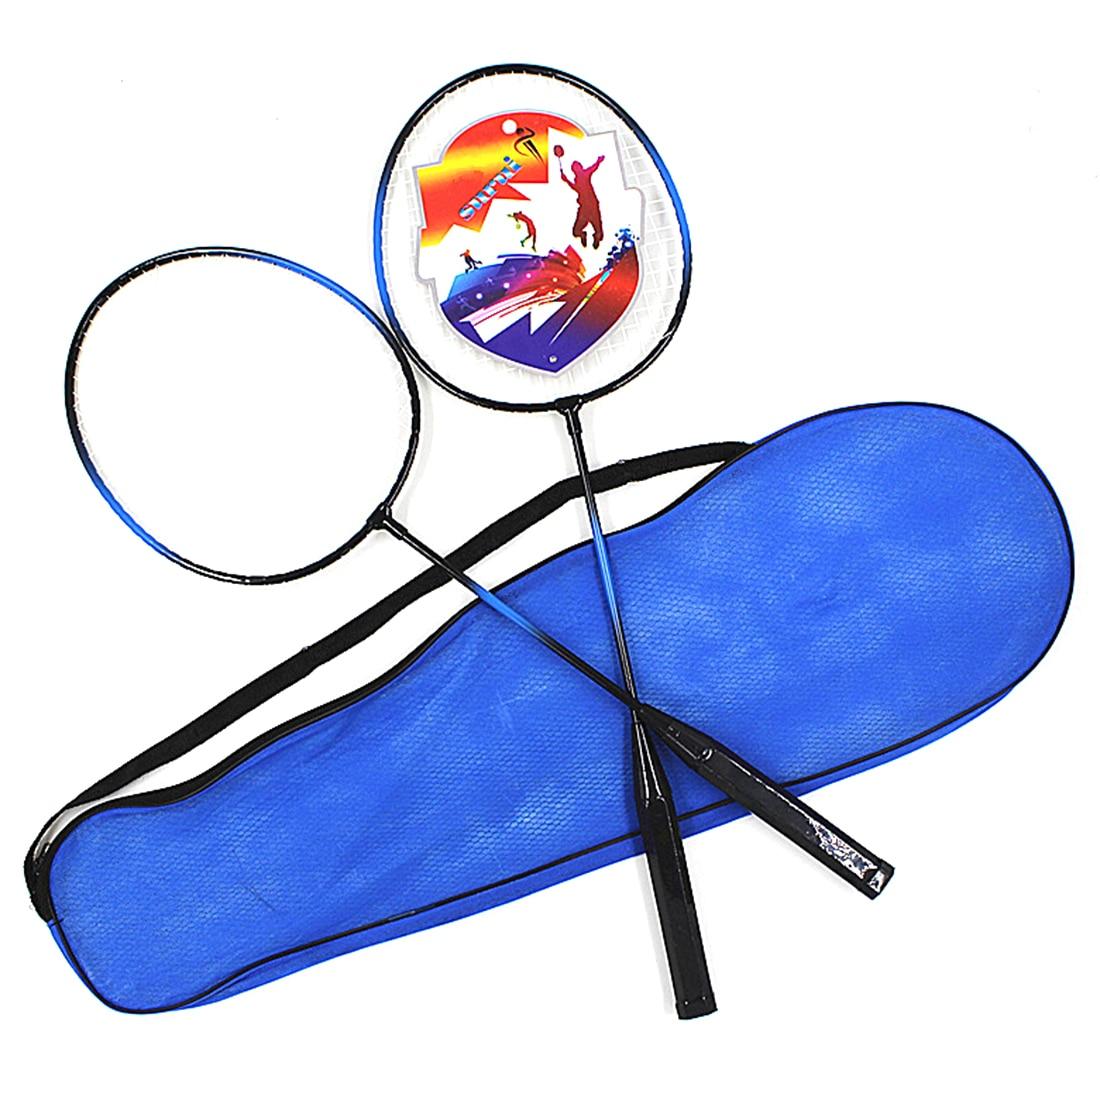 2 Player Badminton Racket Set for Outdoor Games